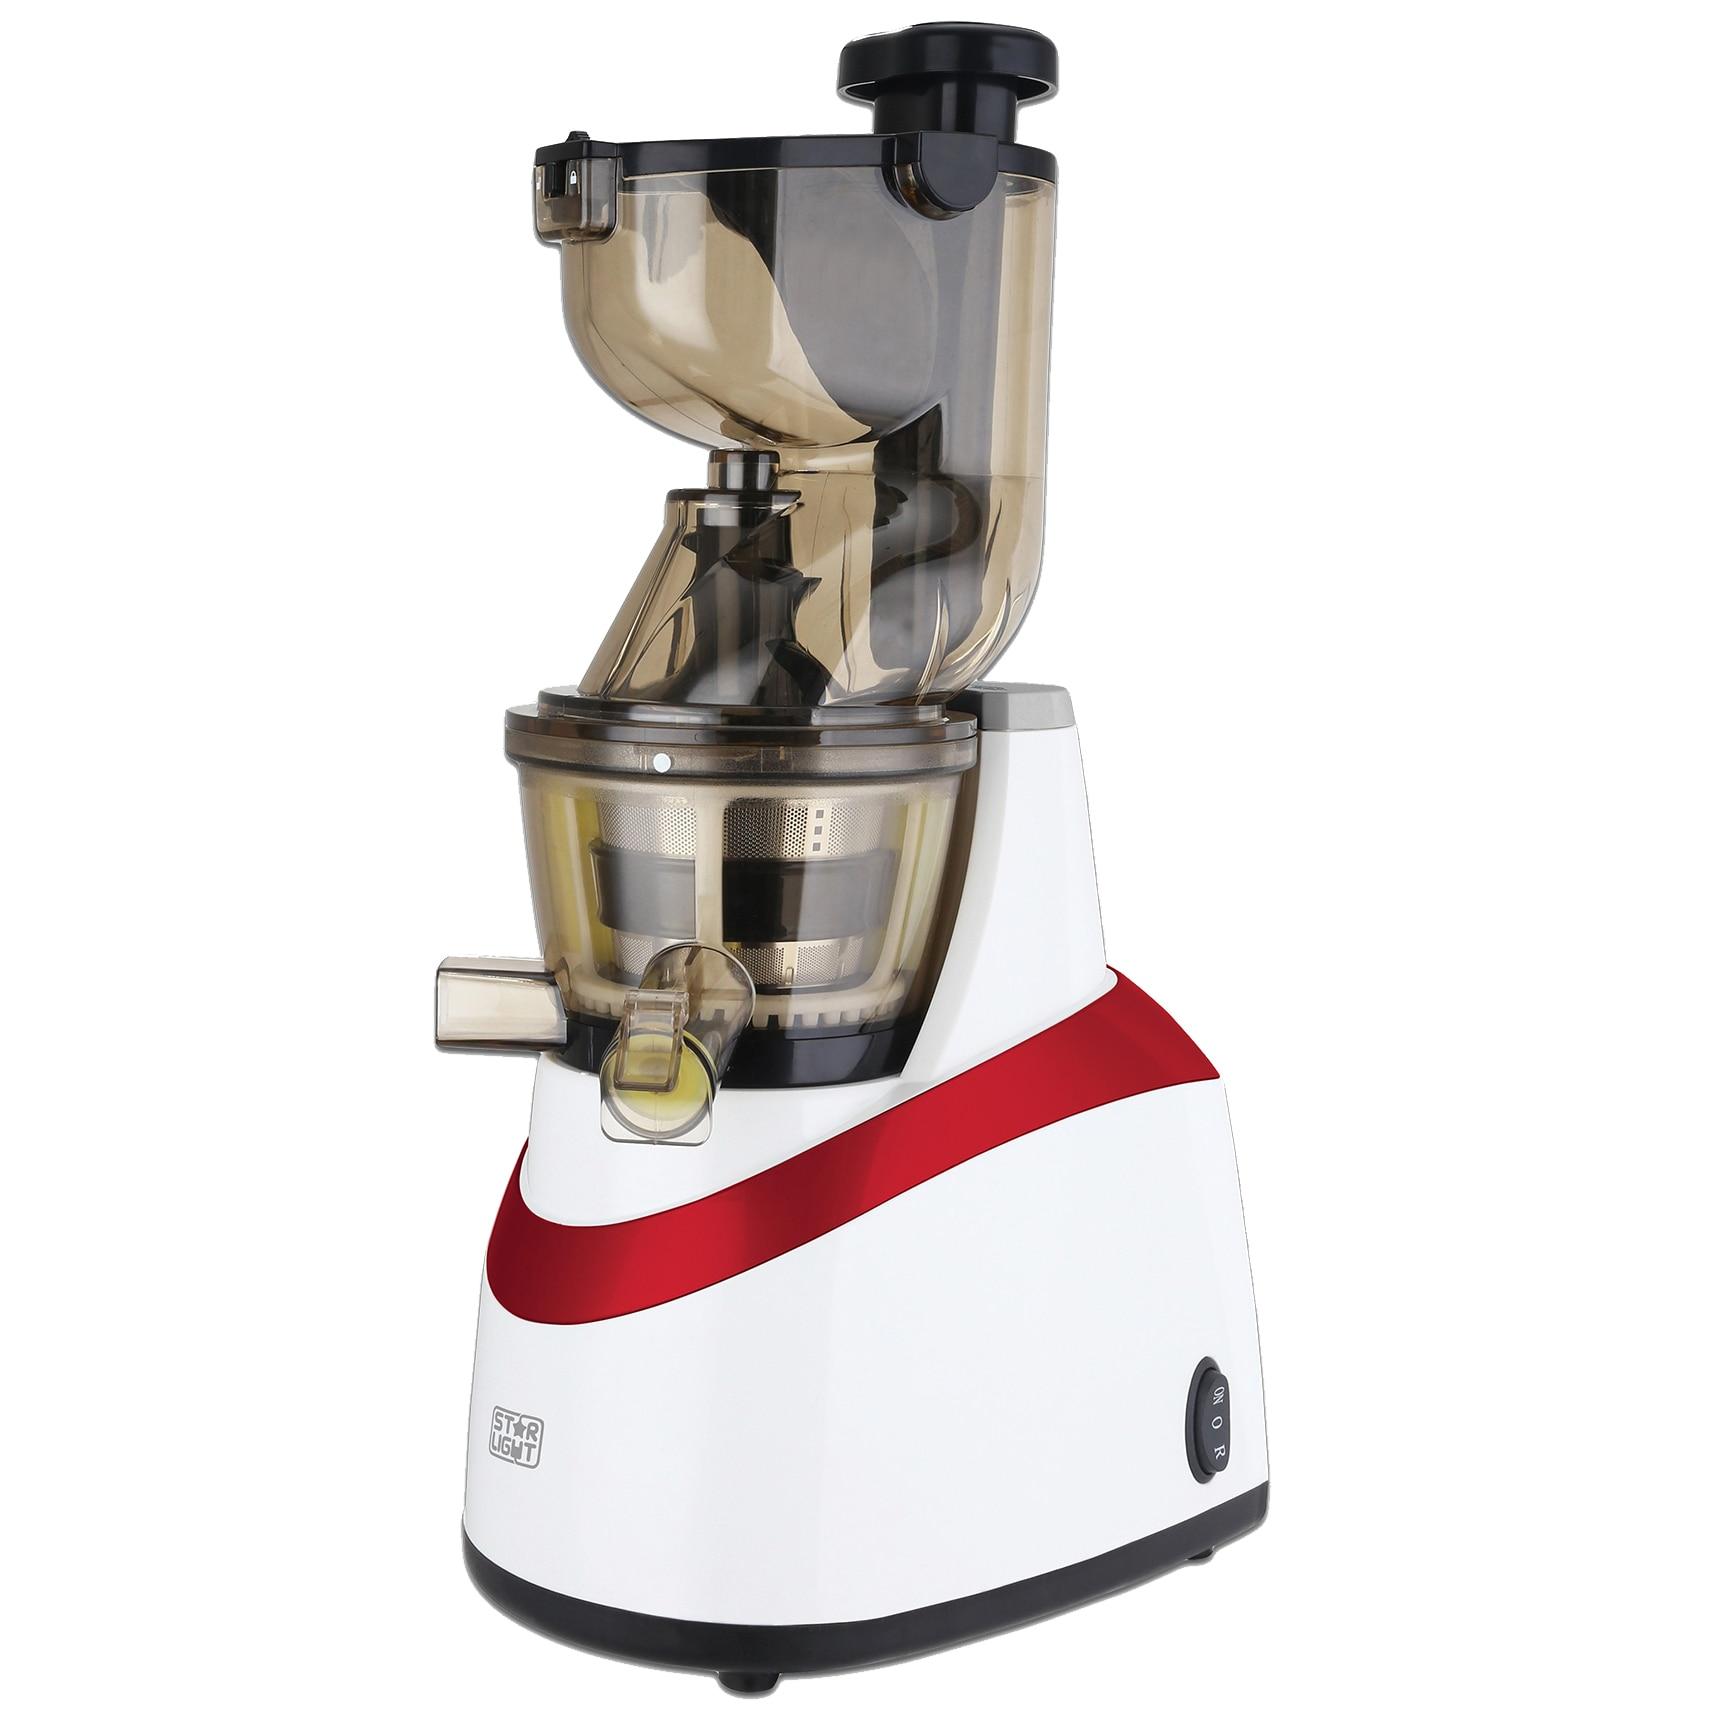 Fotografie Storcator de fructe si legume cu melc Star-Light SJB-240W, 240 W, 80 RPM, Recipient suc 1.0 l, Recipient pulpa 0.8 l, Functie Reverse, Tub alimentare 80 mm, Alb/Rosu